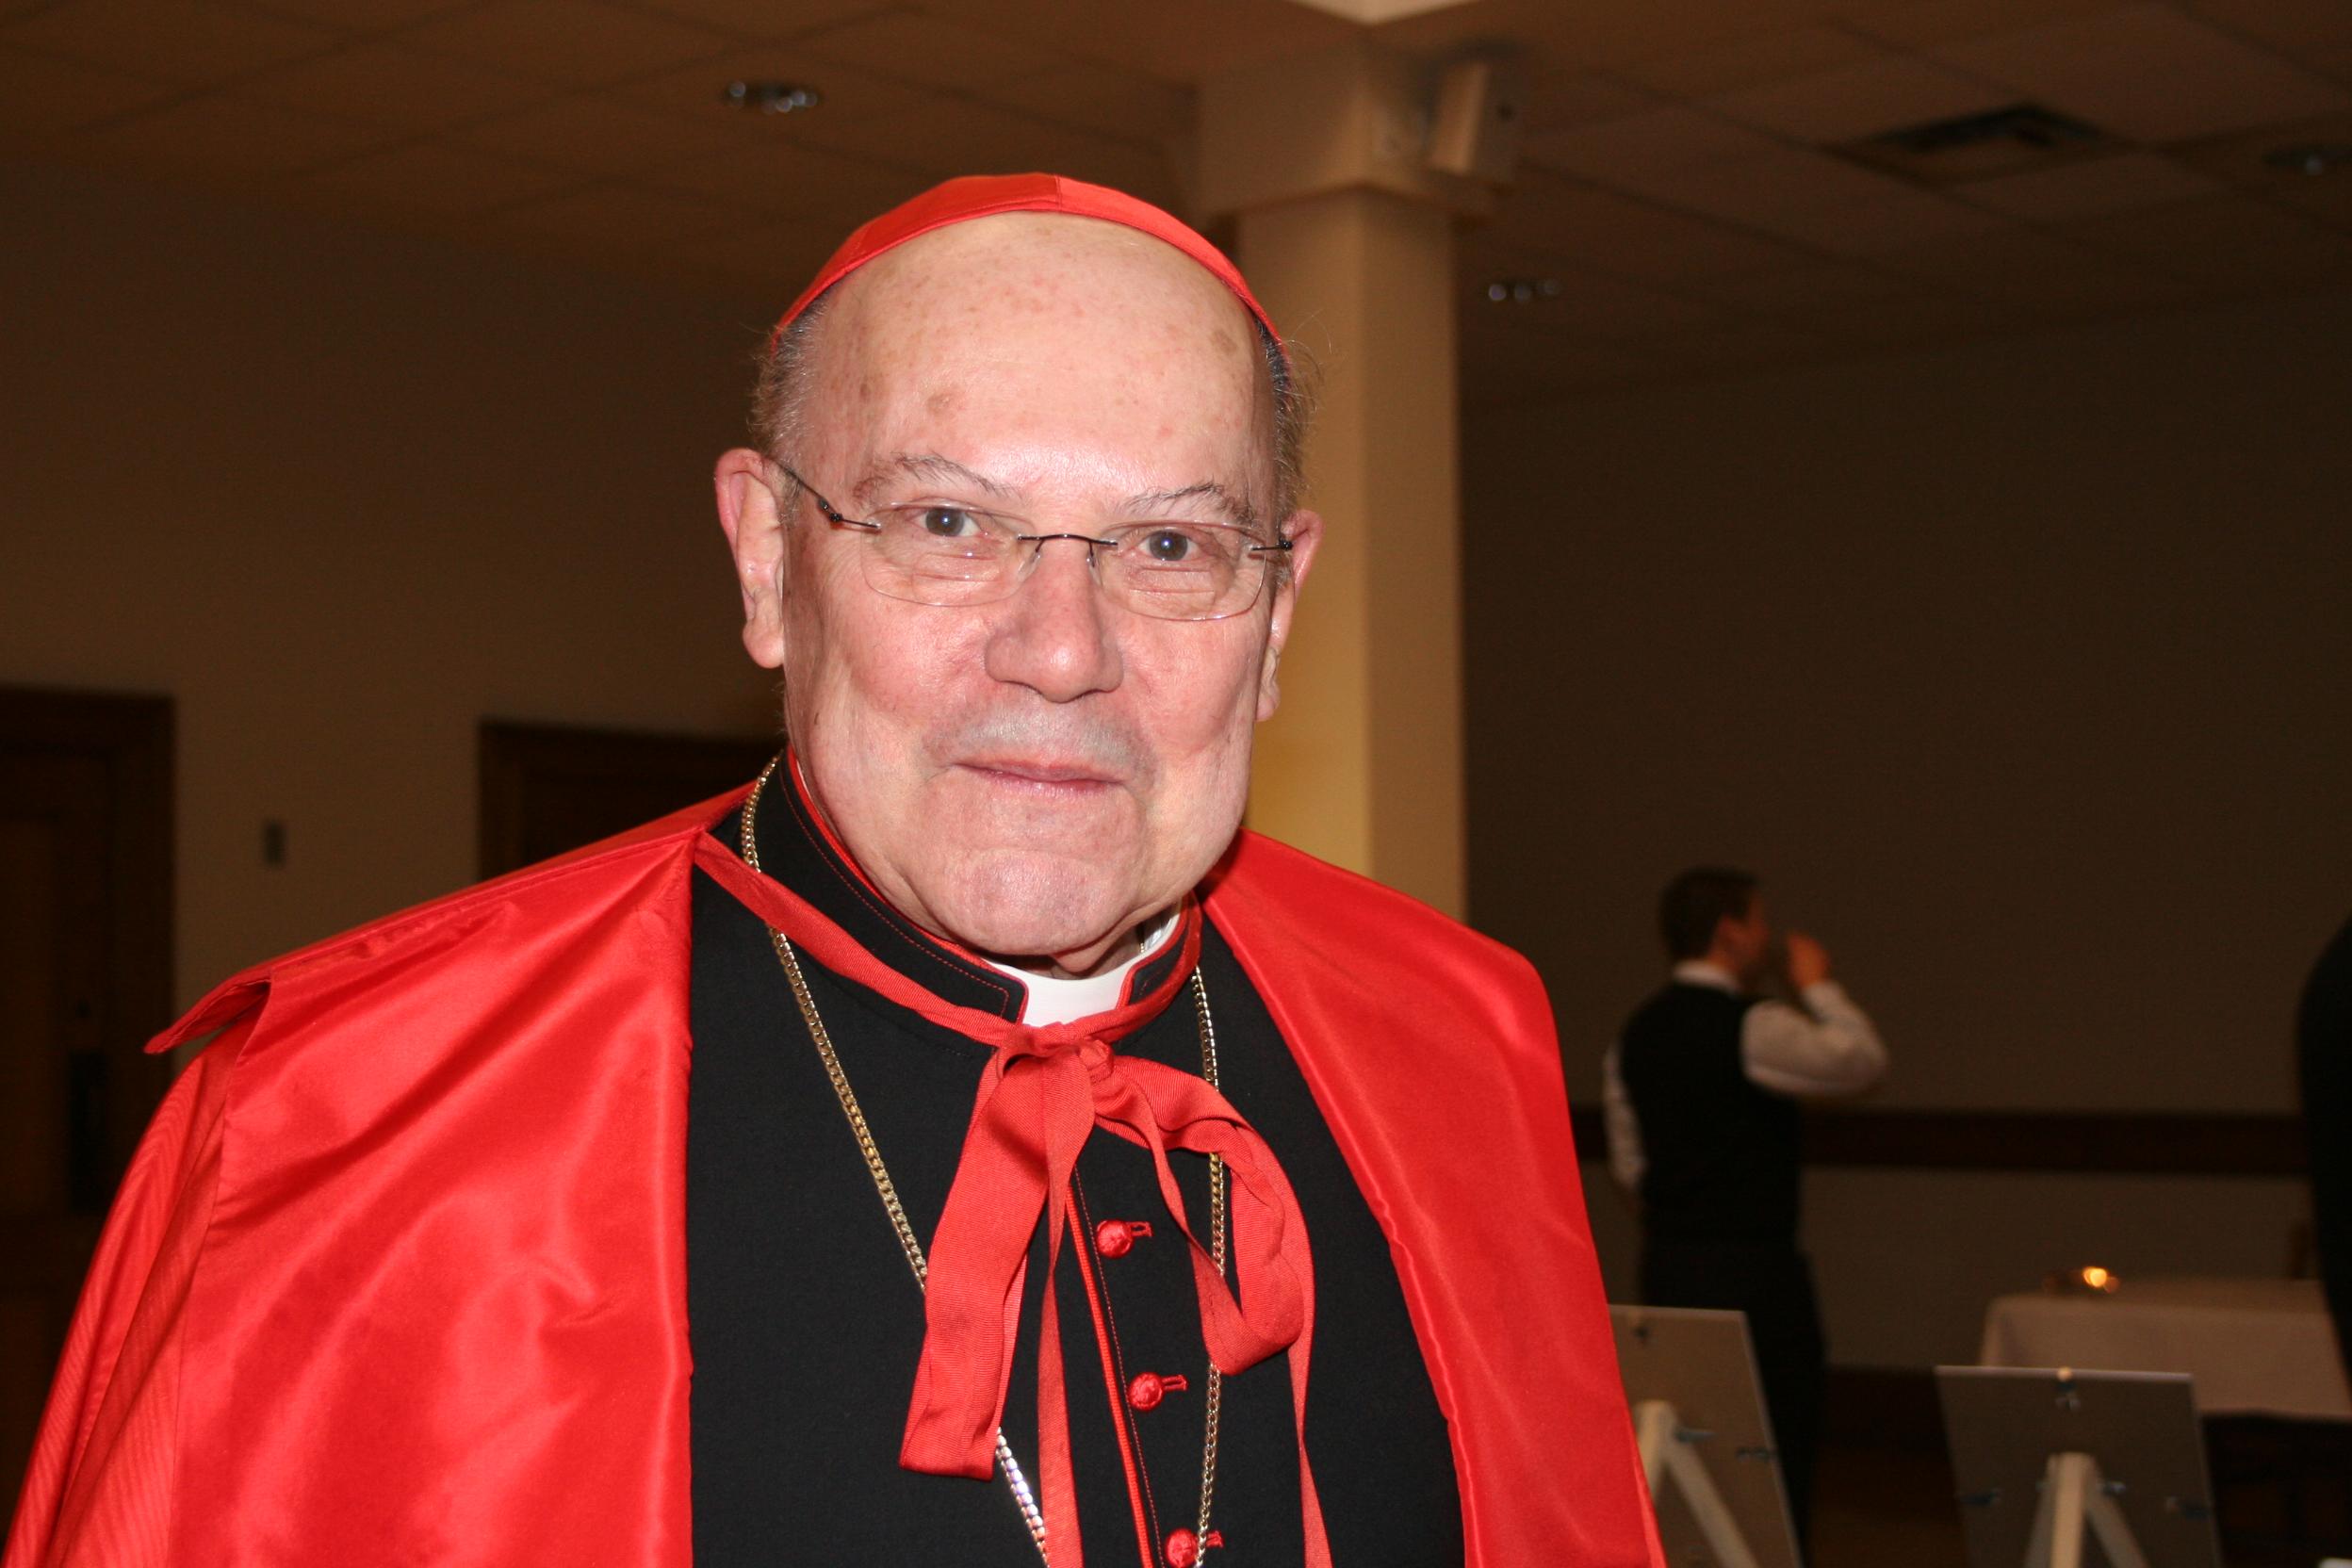 Bishop John C Wester | rapevictimsofthecatholicchurch